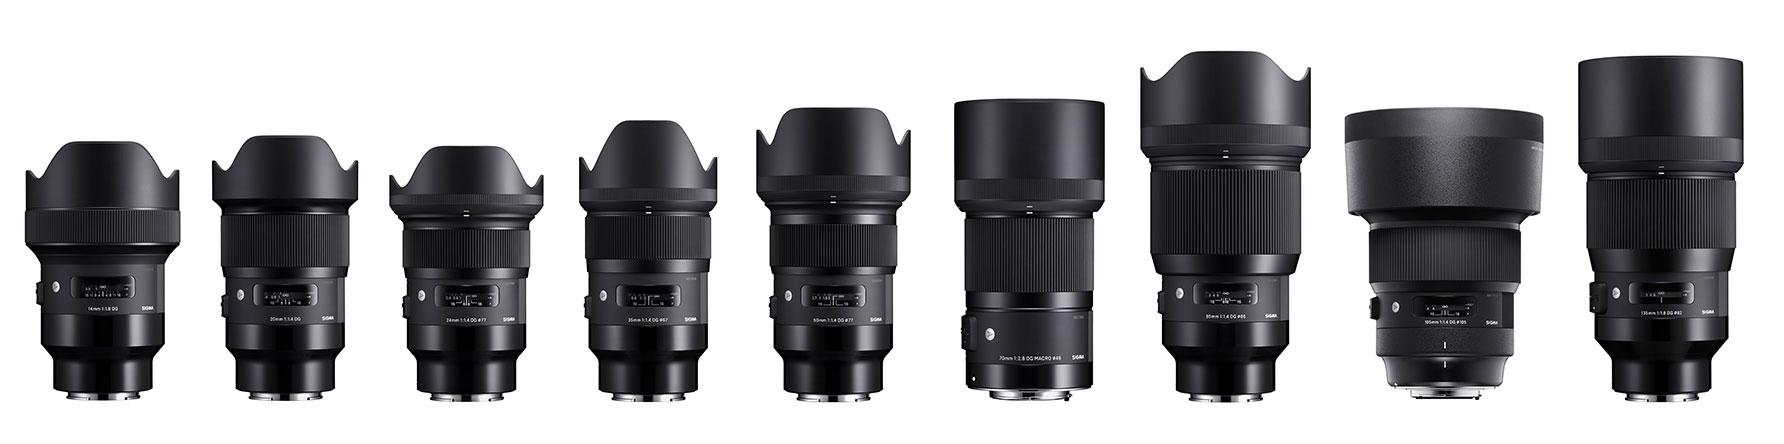 Sigma Announce Art Lenses For Sony E Mount New 105mm F14 Dg Hsm 35mm I 14mm F18 20mm 24mm 50mm 70mm F 28 Macro